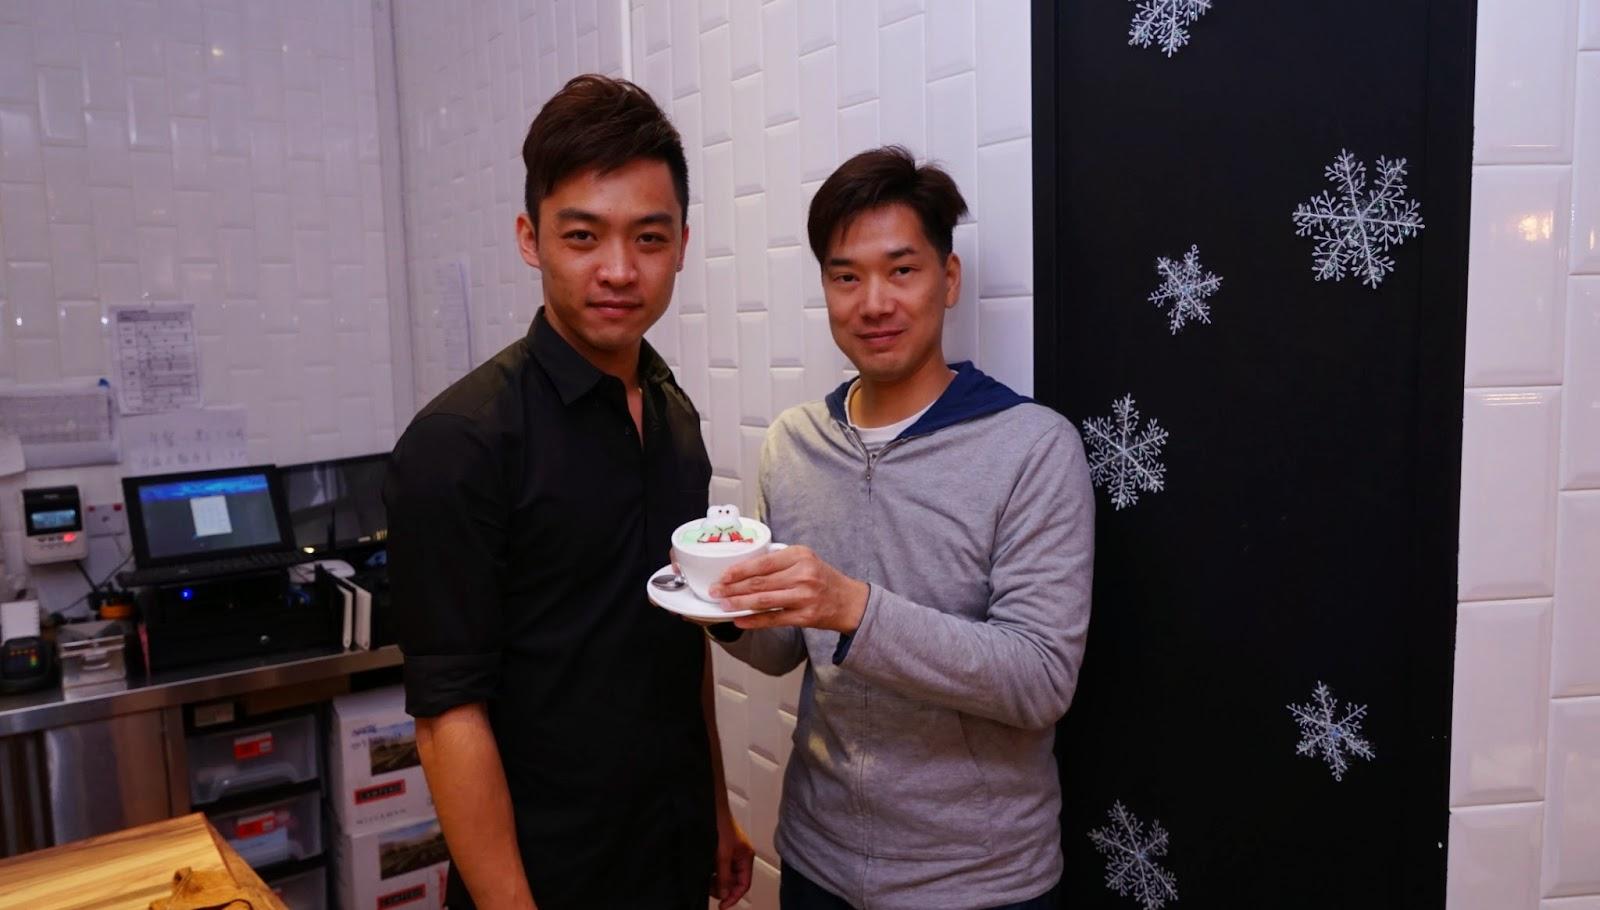 香港 新蒲崗 Mikiki Karena Cafe 3D拉花 咖啡 晚餐 Cappuccino Keroppi